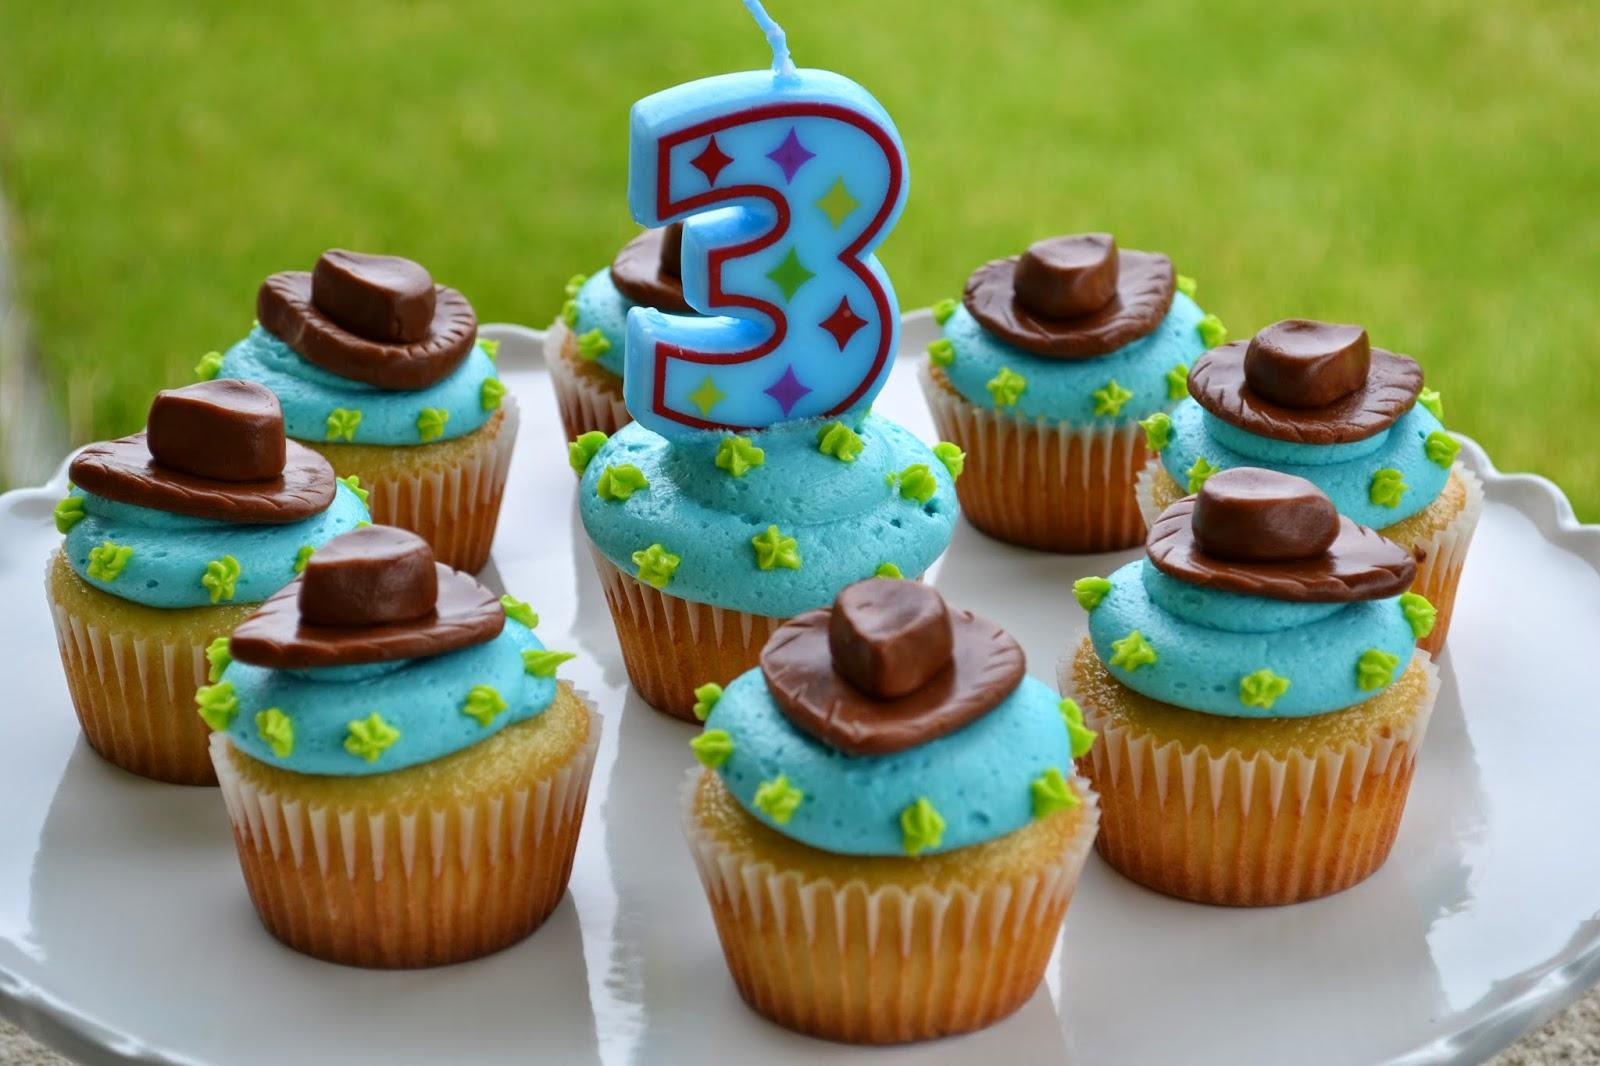 Woody Cupcakes